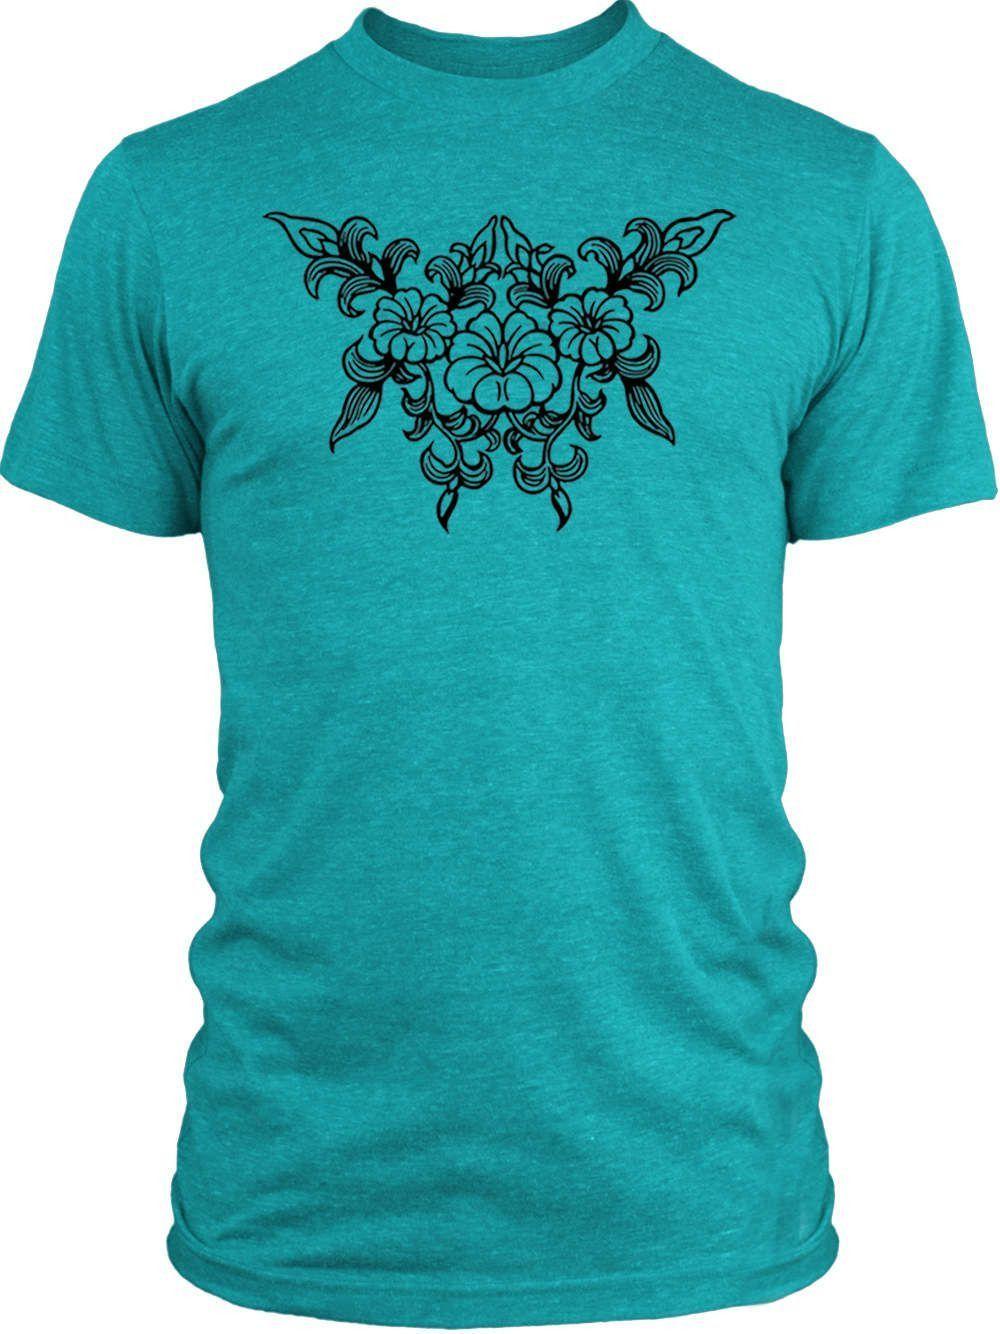 Big Texas Flower Tattoo (Black) Vintage Tri-Blend T-Shirt